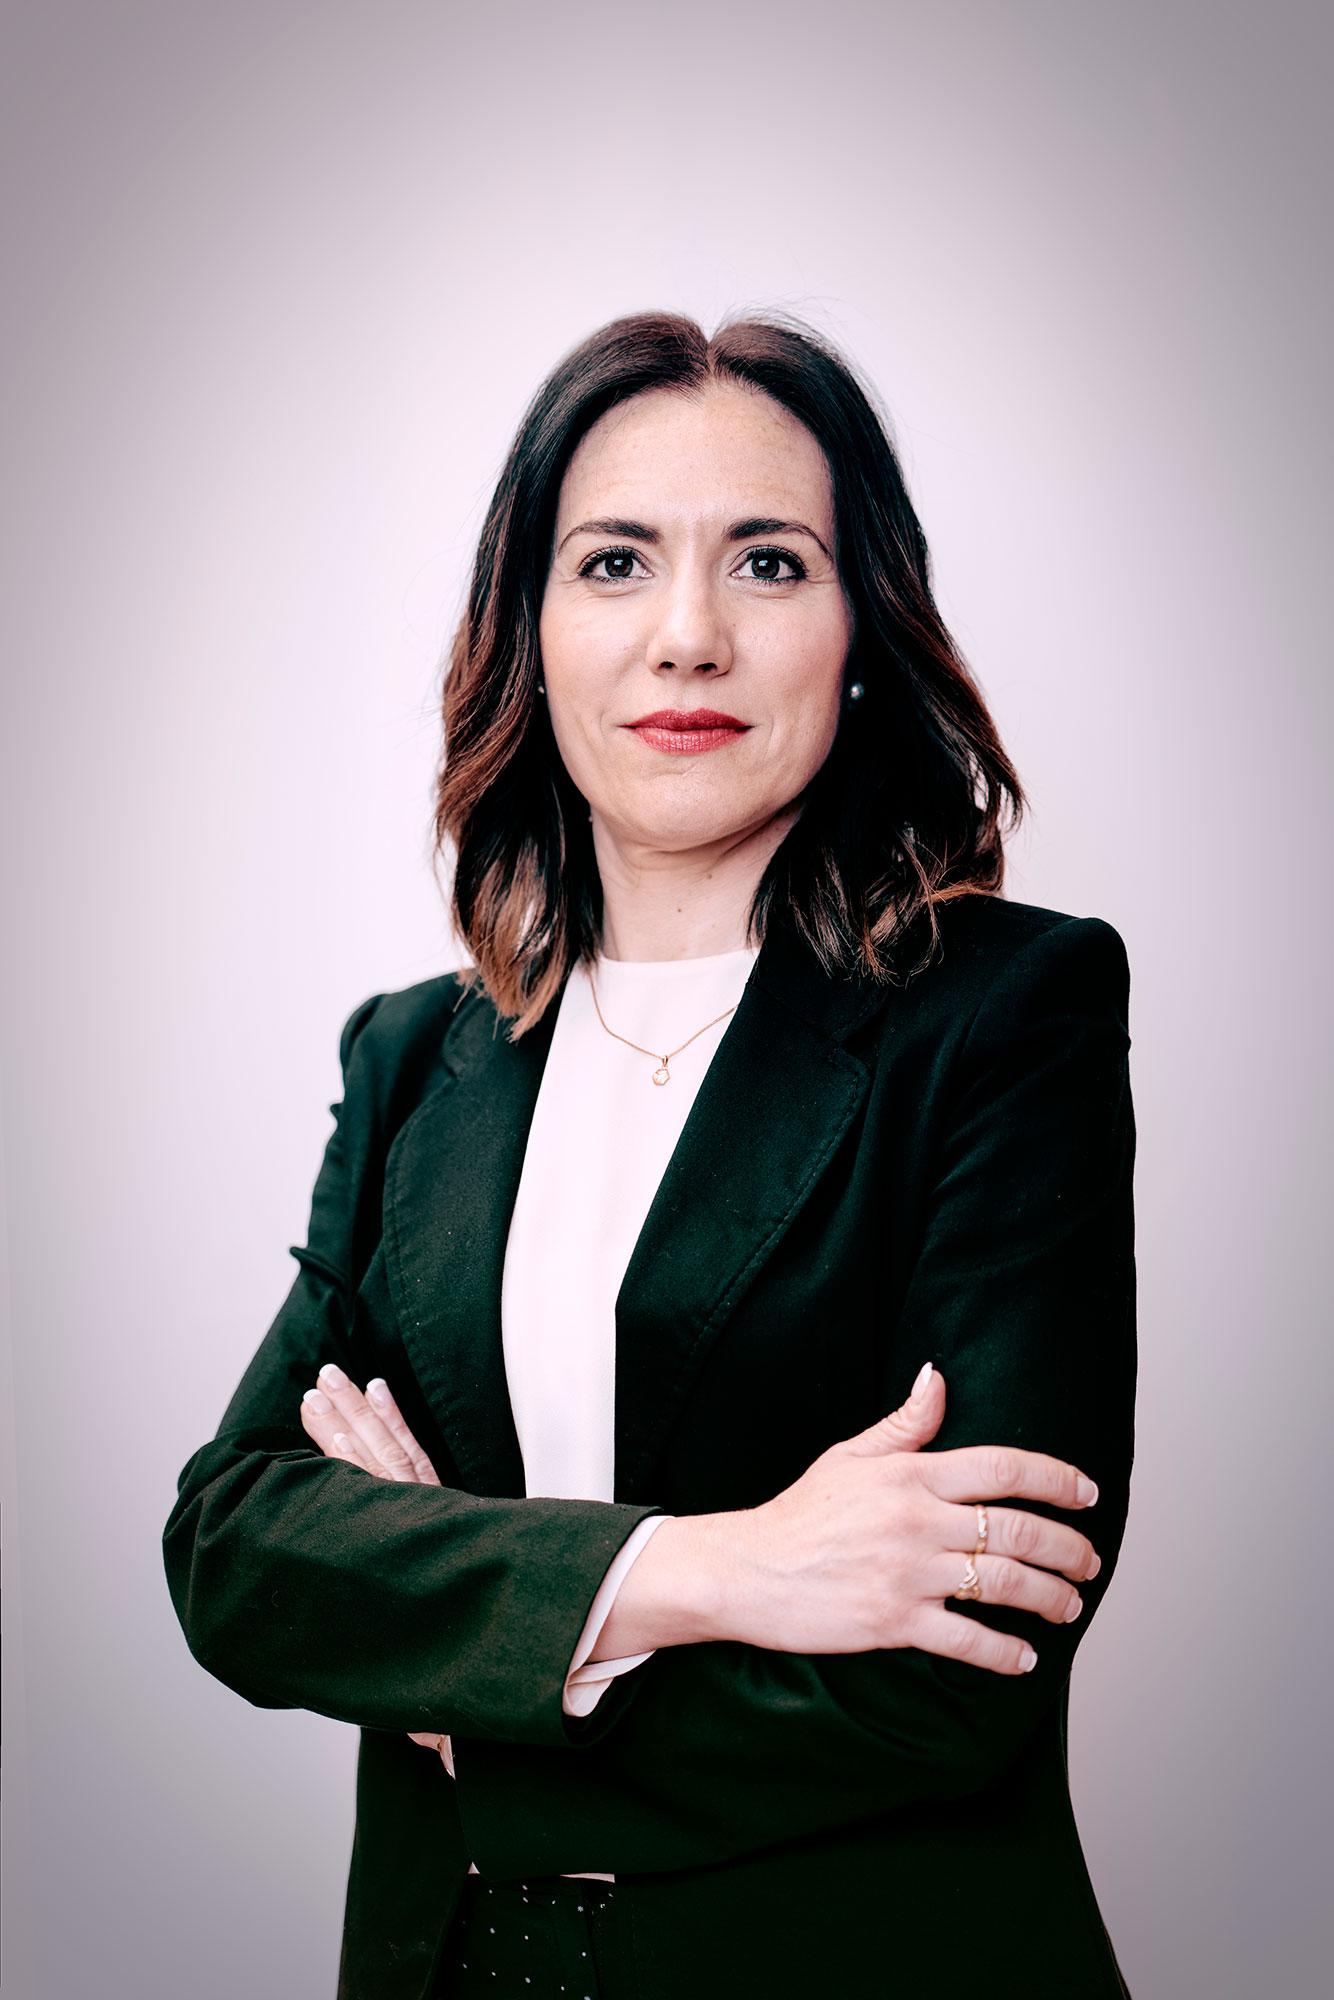 María Molina Jiménez